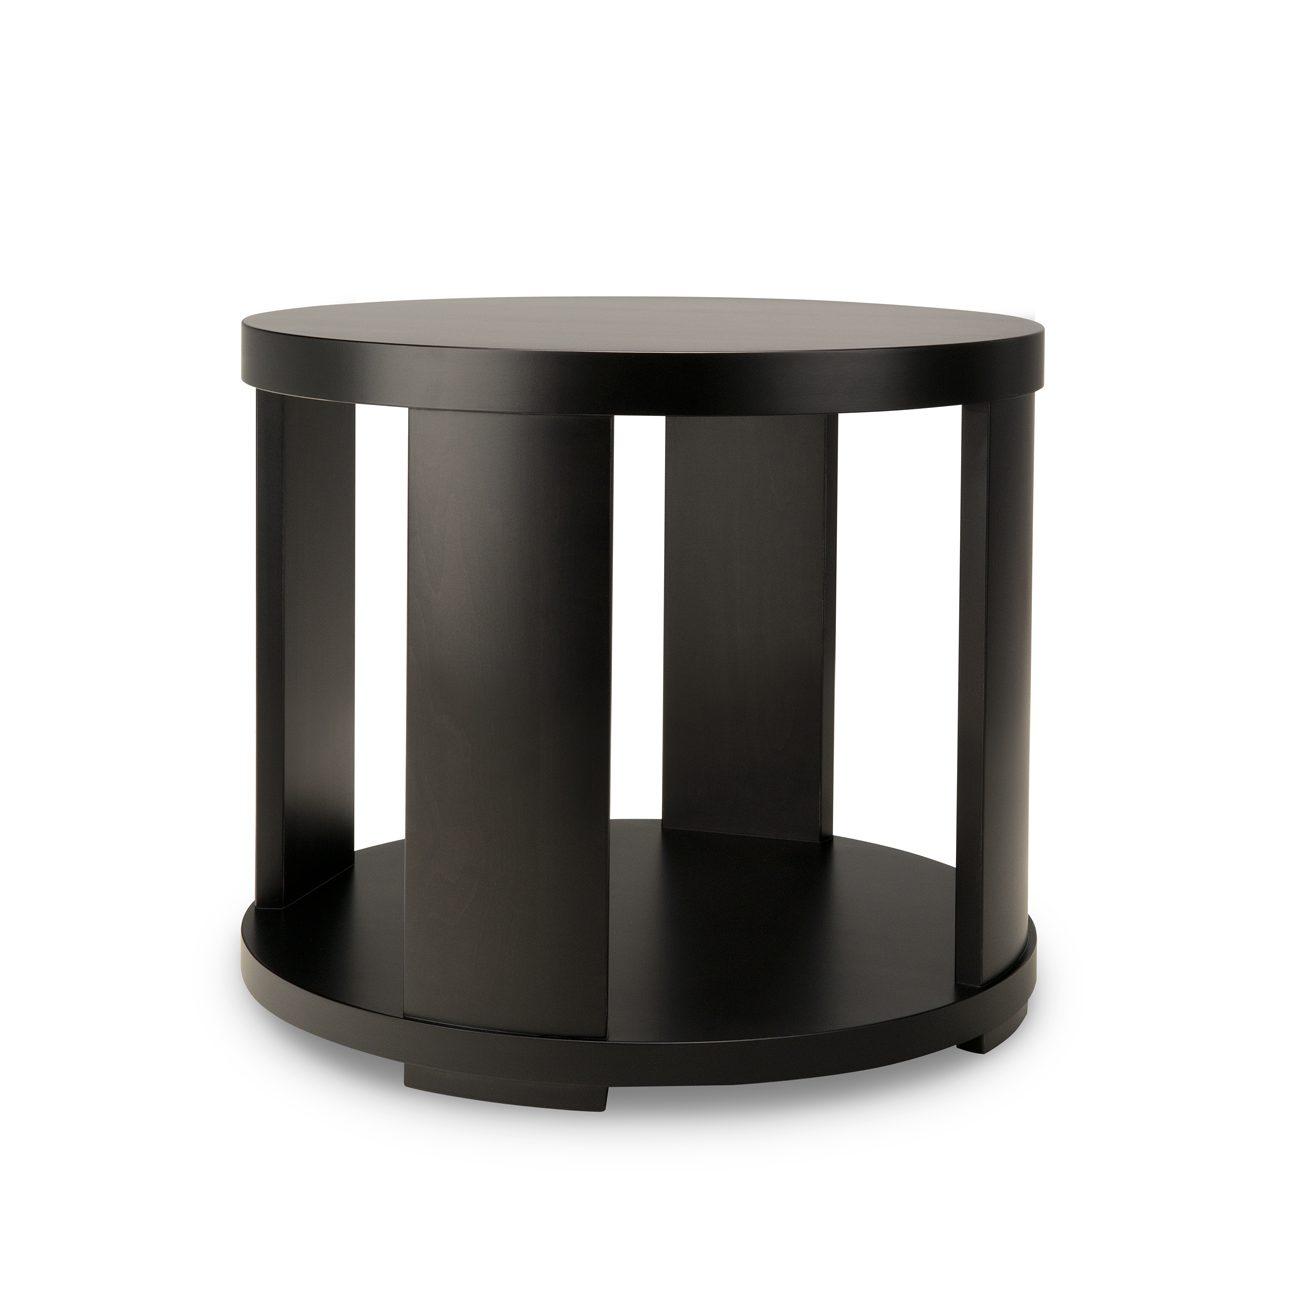 Drum-End-Table-B-PROOF-1-e1559180341510-1.jpg